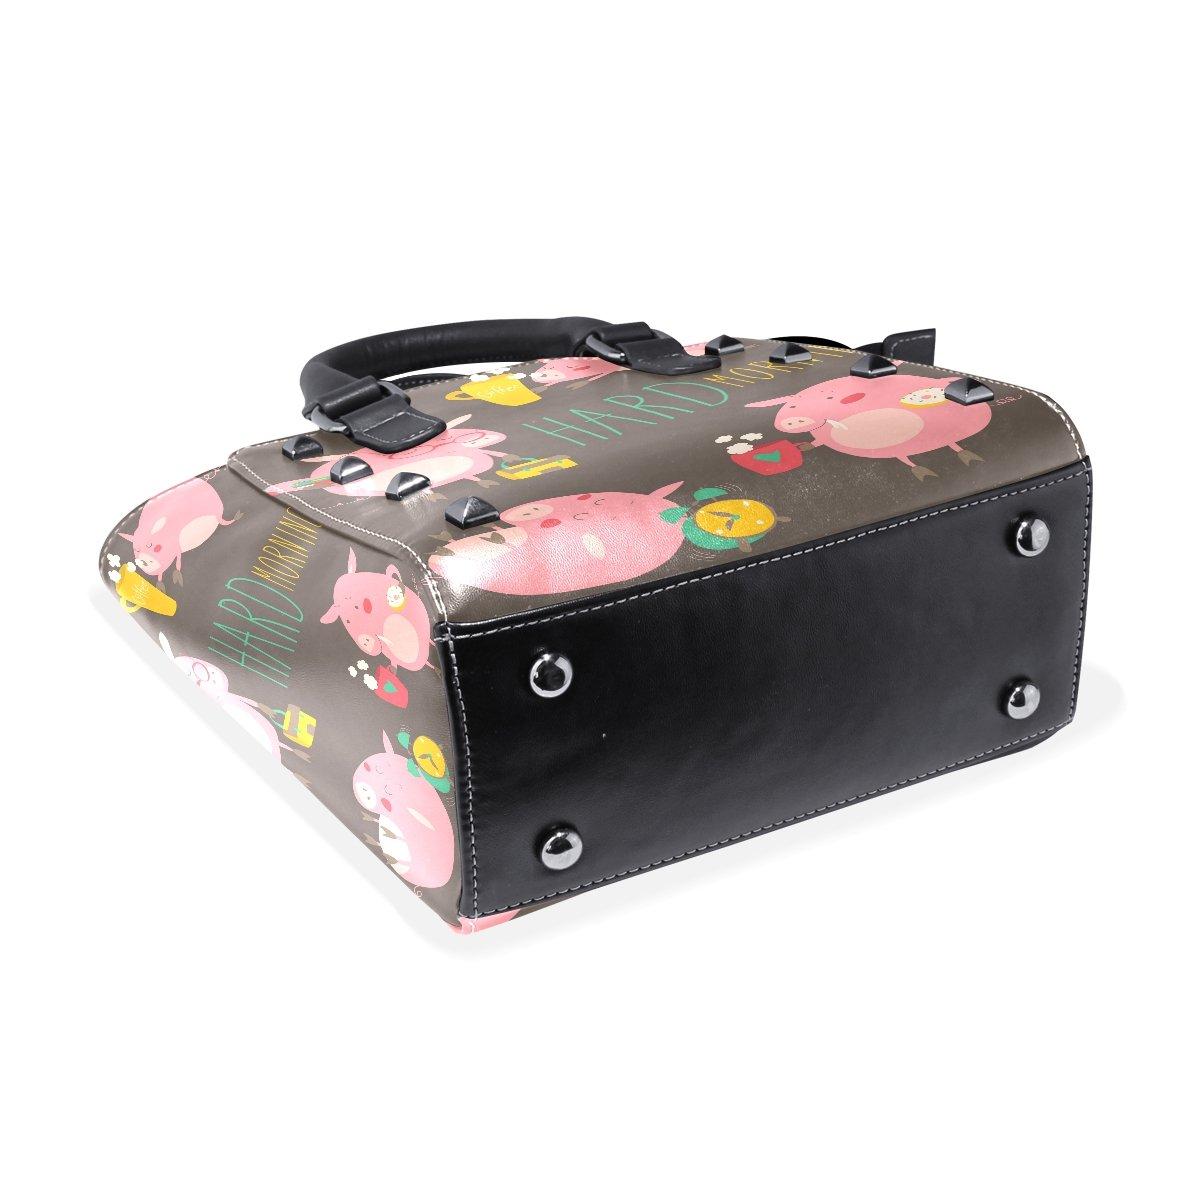 Jennifer PU Leather Top-Handle Handbags Pink Pig Hard Morning Single-Shoulder Tote Crossbody Bag Messenger Bags For Women